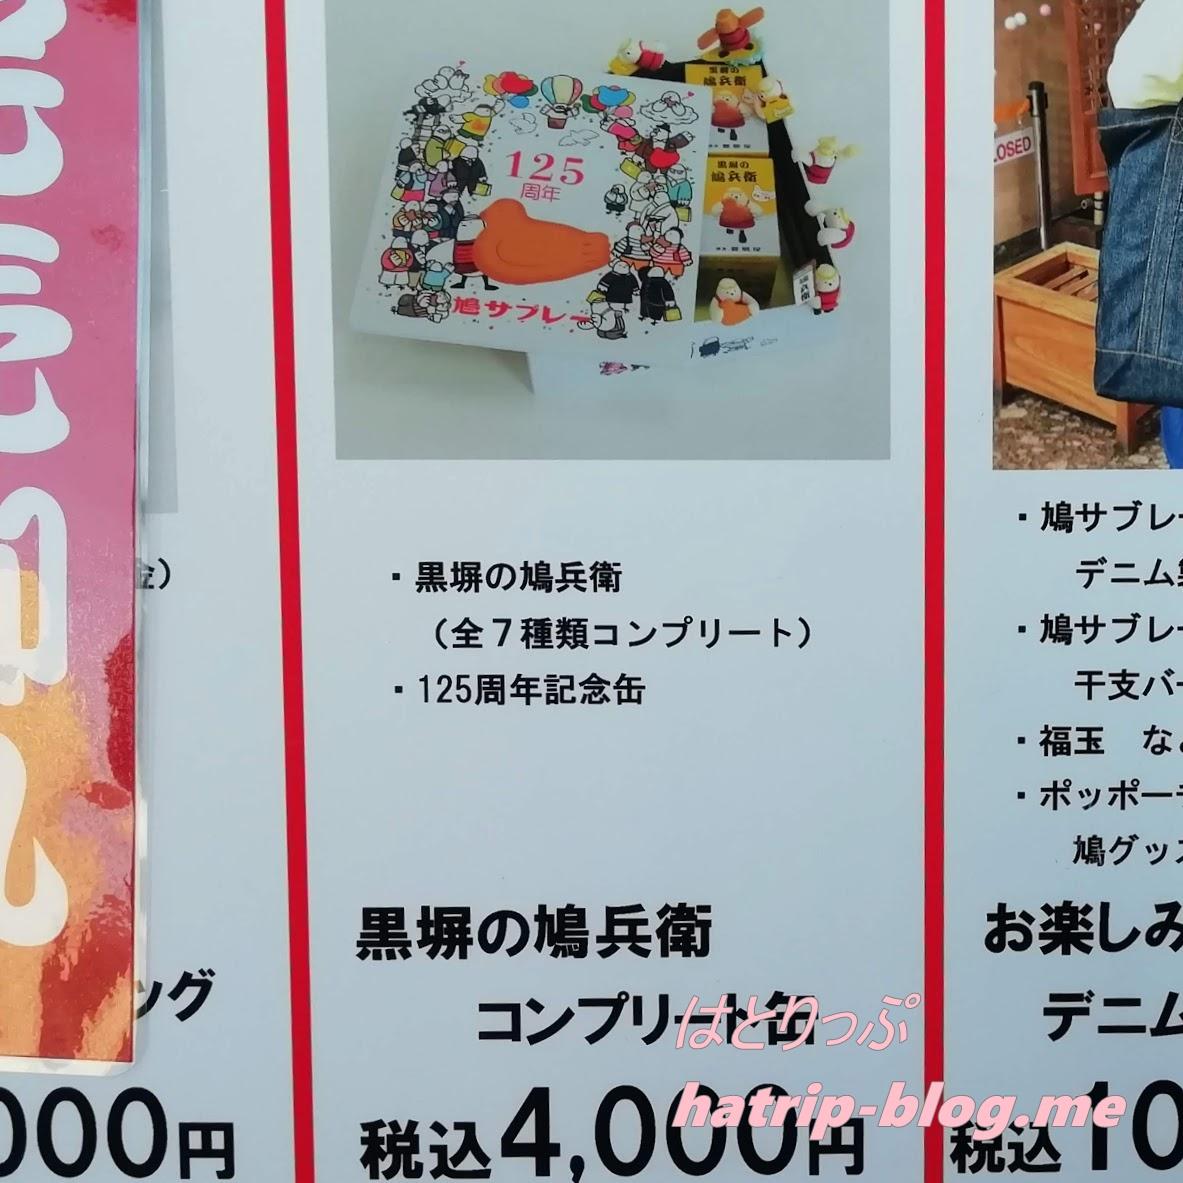 神奈川県鎌倉市 豊島屋本店 2020年 鳩正月 黒塀の鳩兵衛コンプリート缶